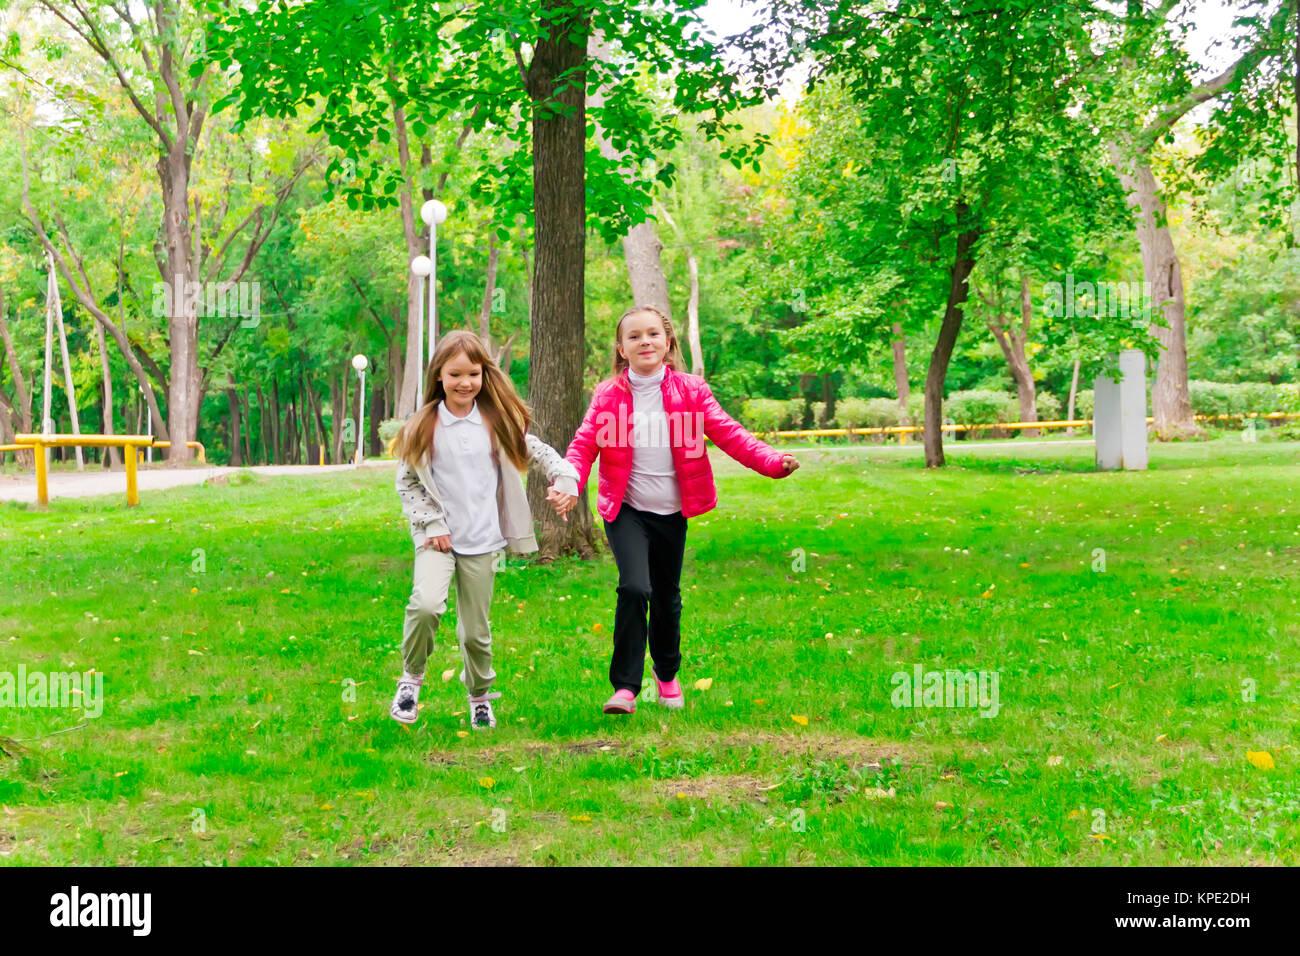 Cute two running girls - Stock Image